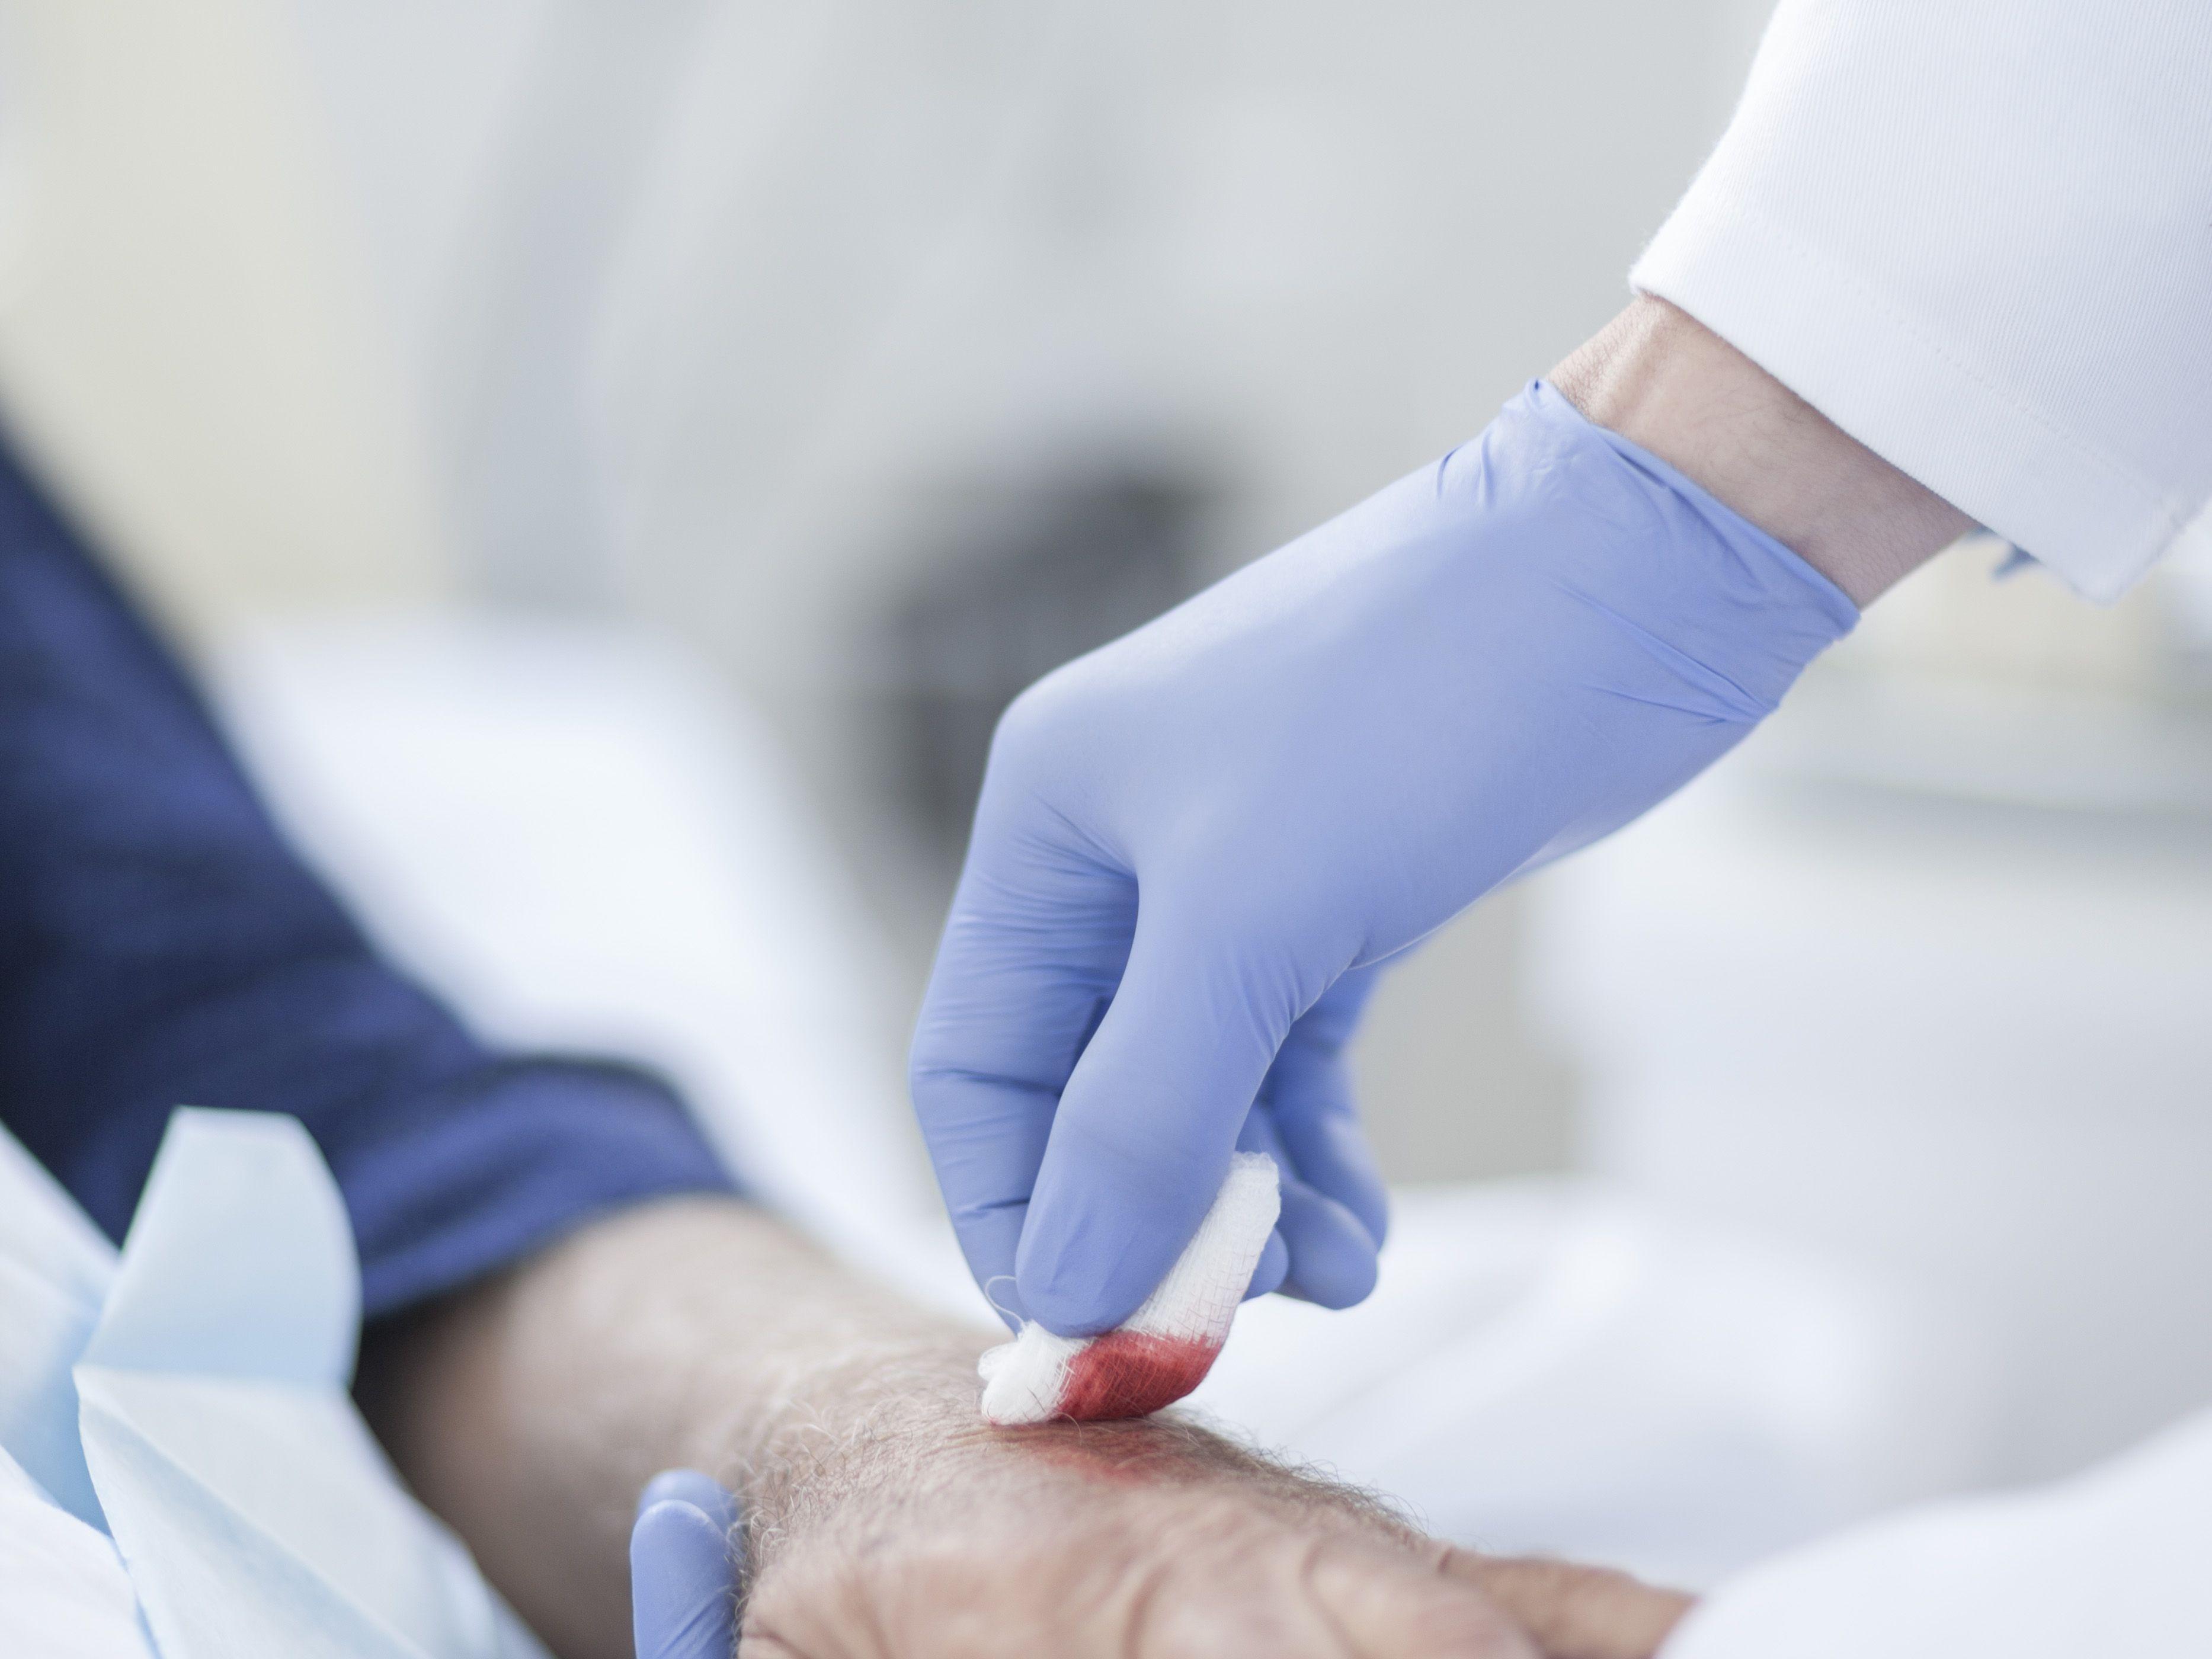 Cellulitis: Symptoms, Causes, Diagnosis, and Treatment